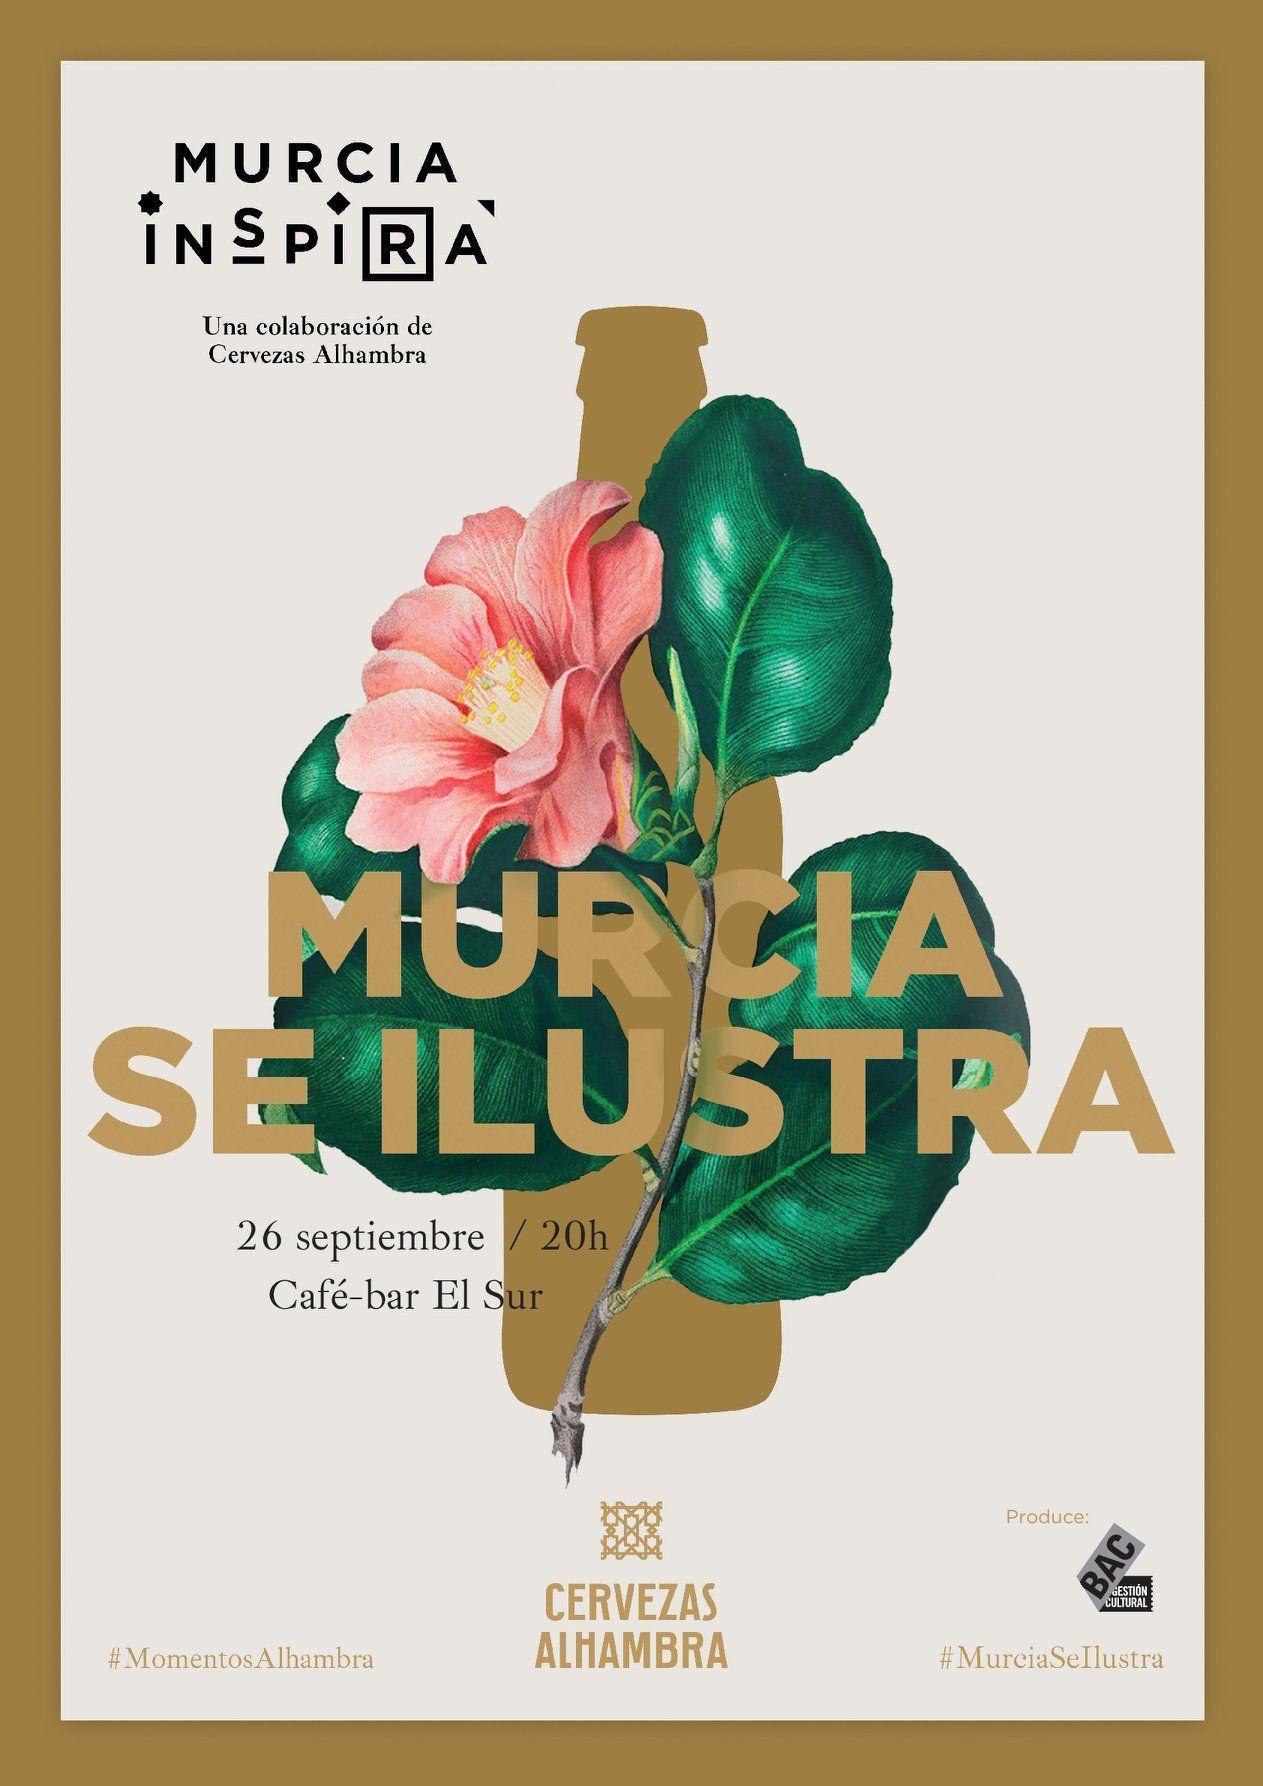 Murcia Se Ilustra